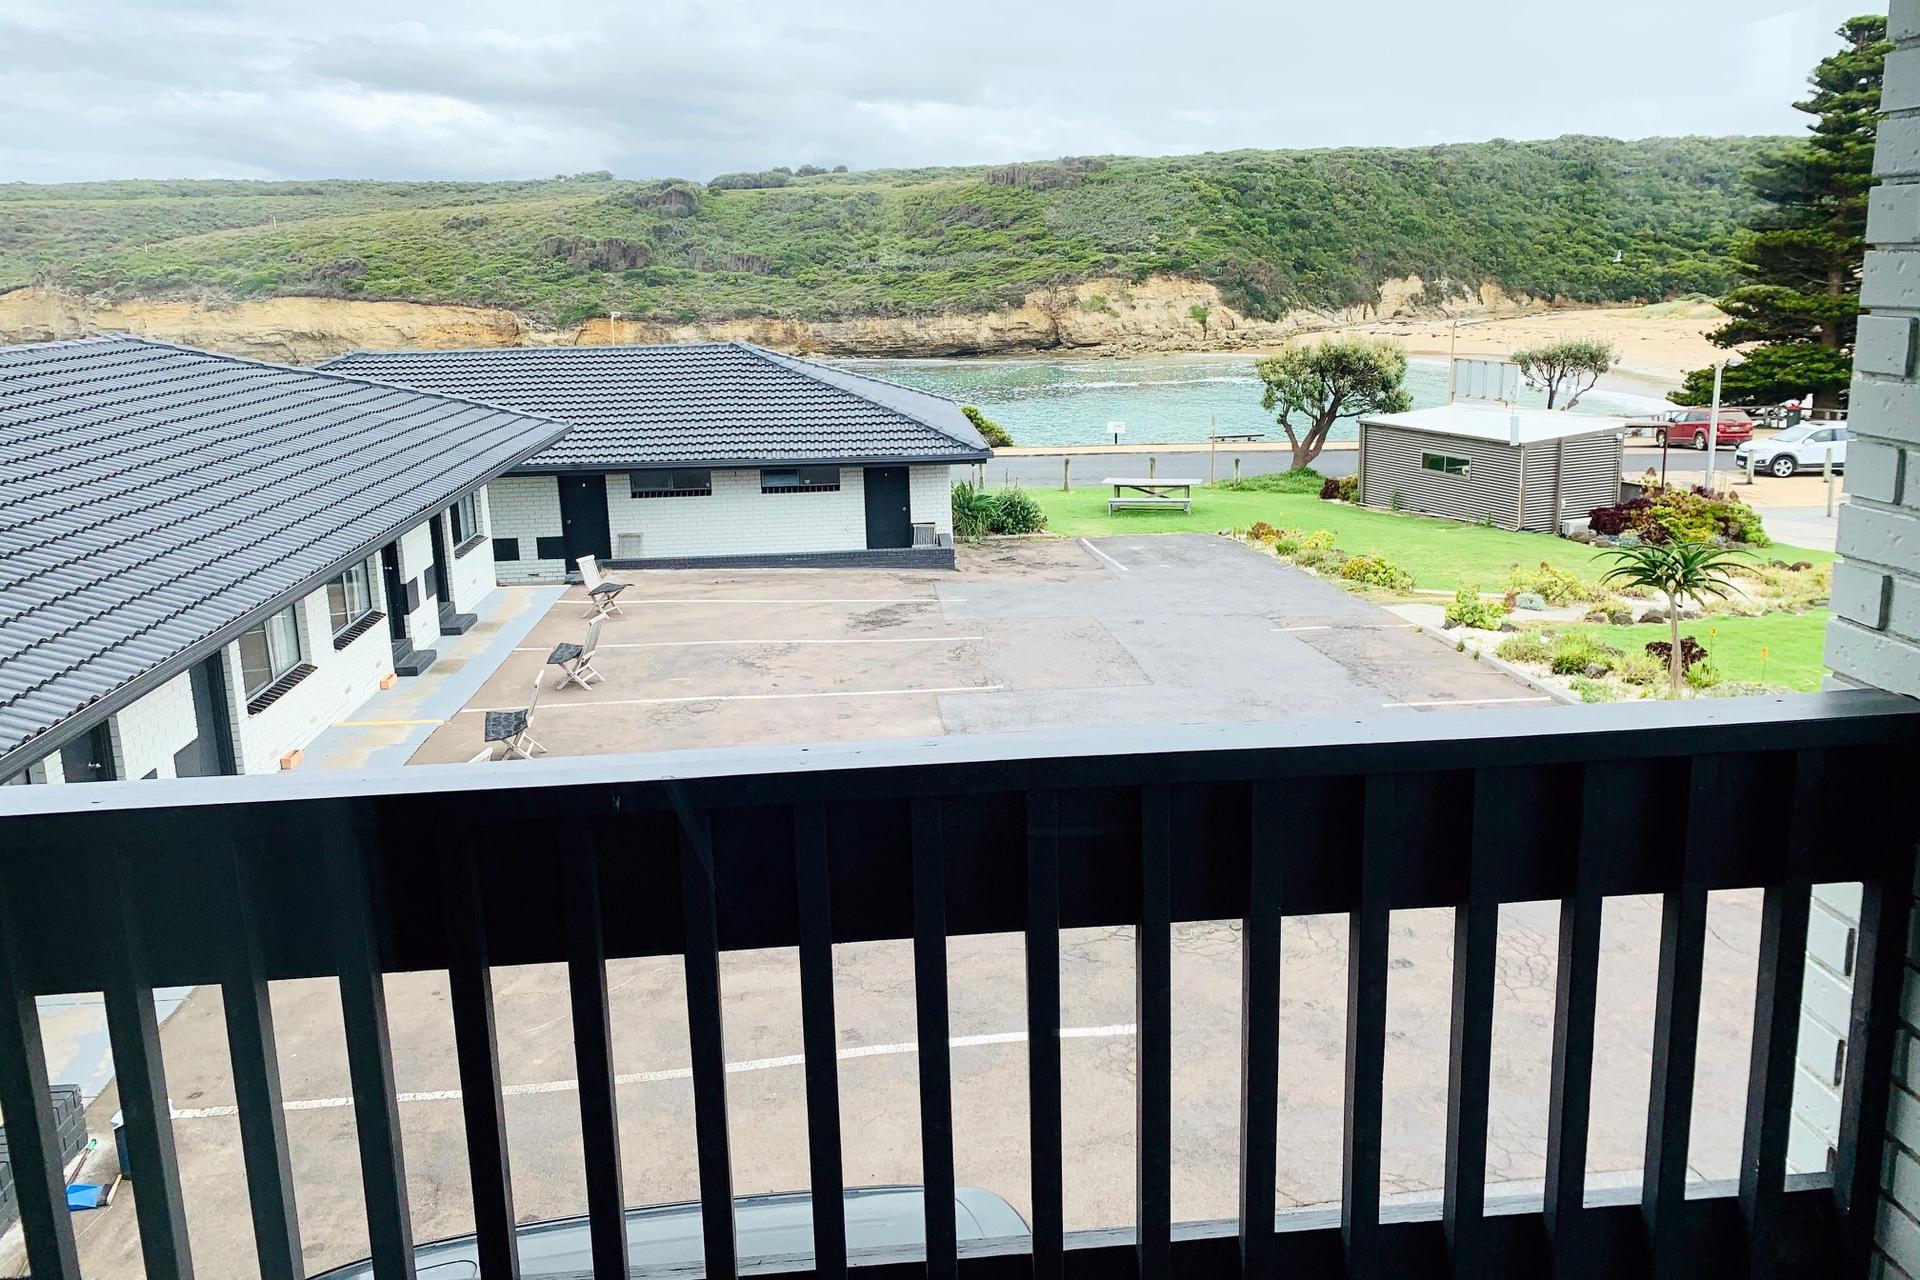 d - Southern Ocean Motor Inn